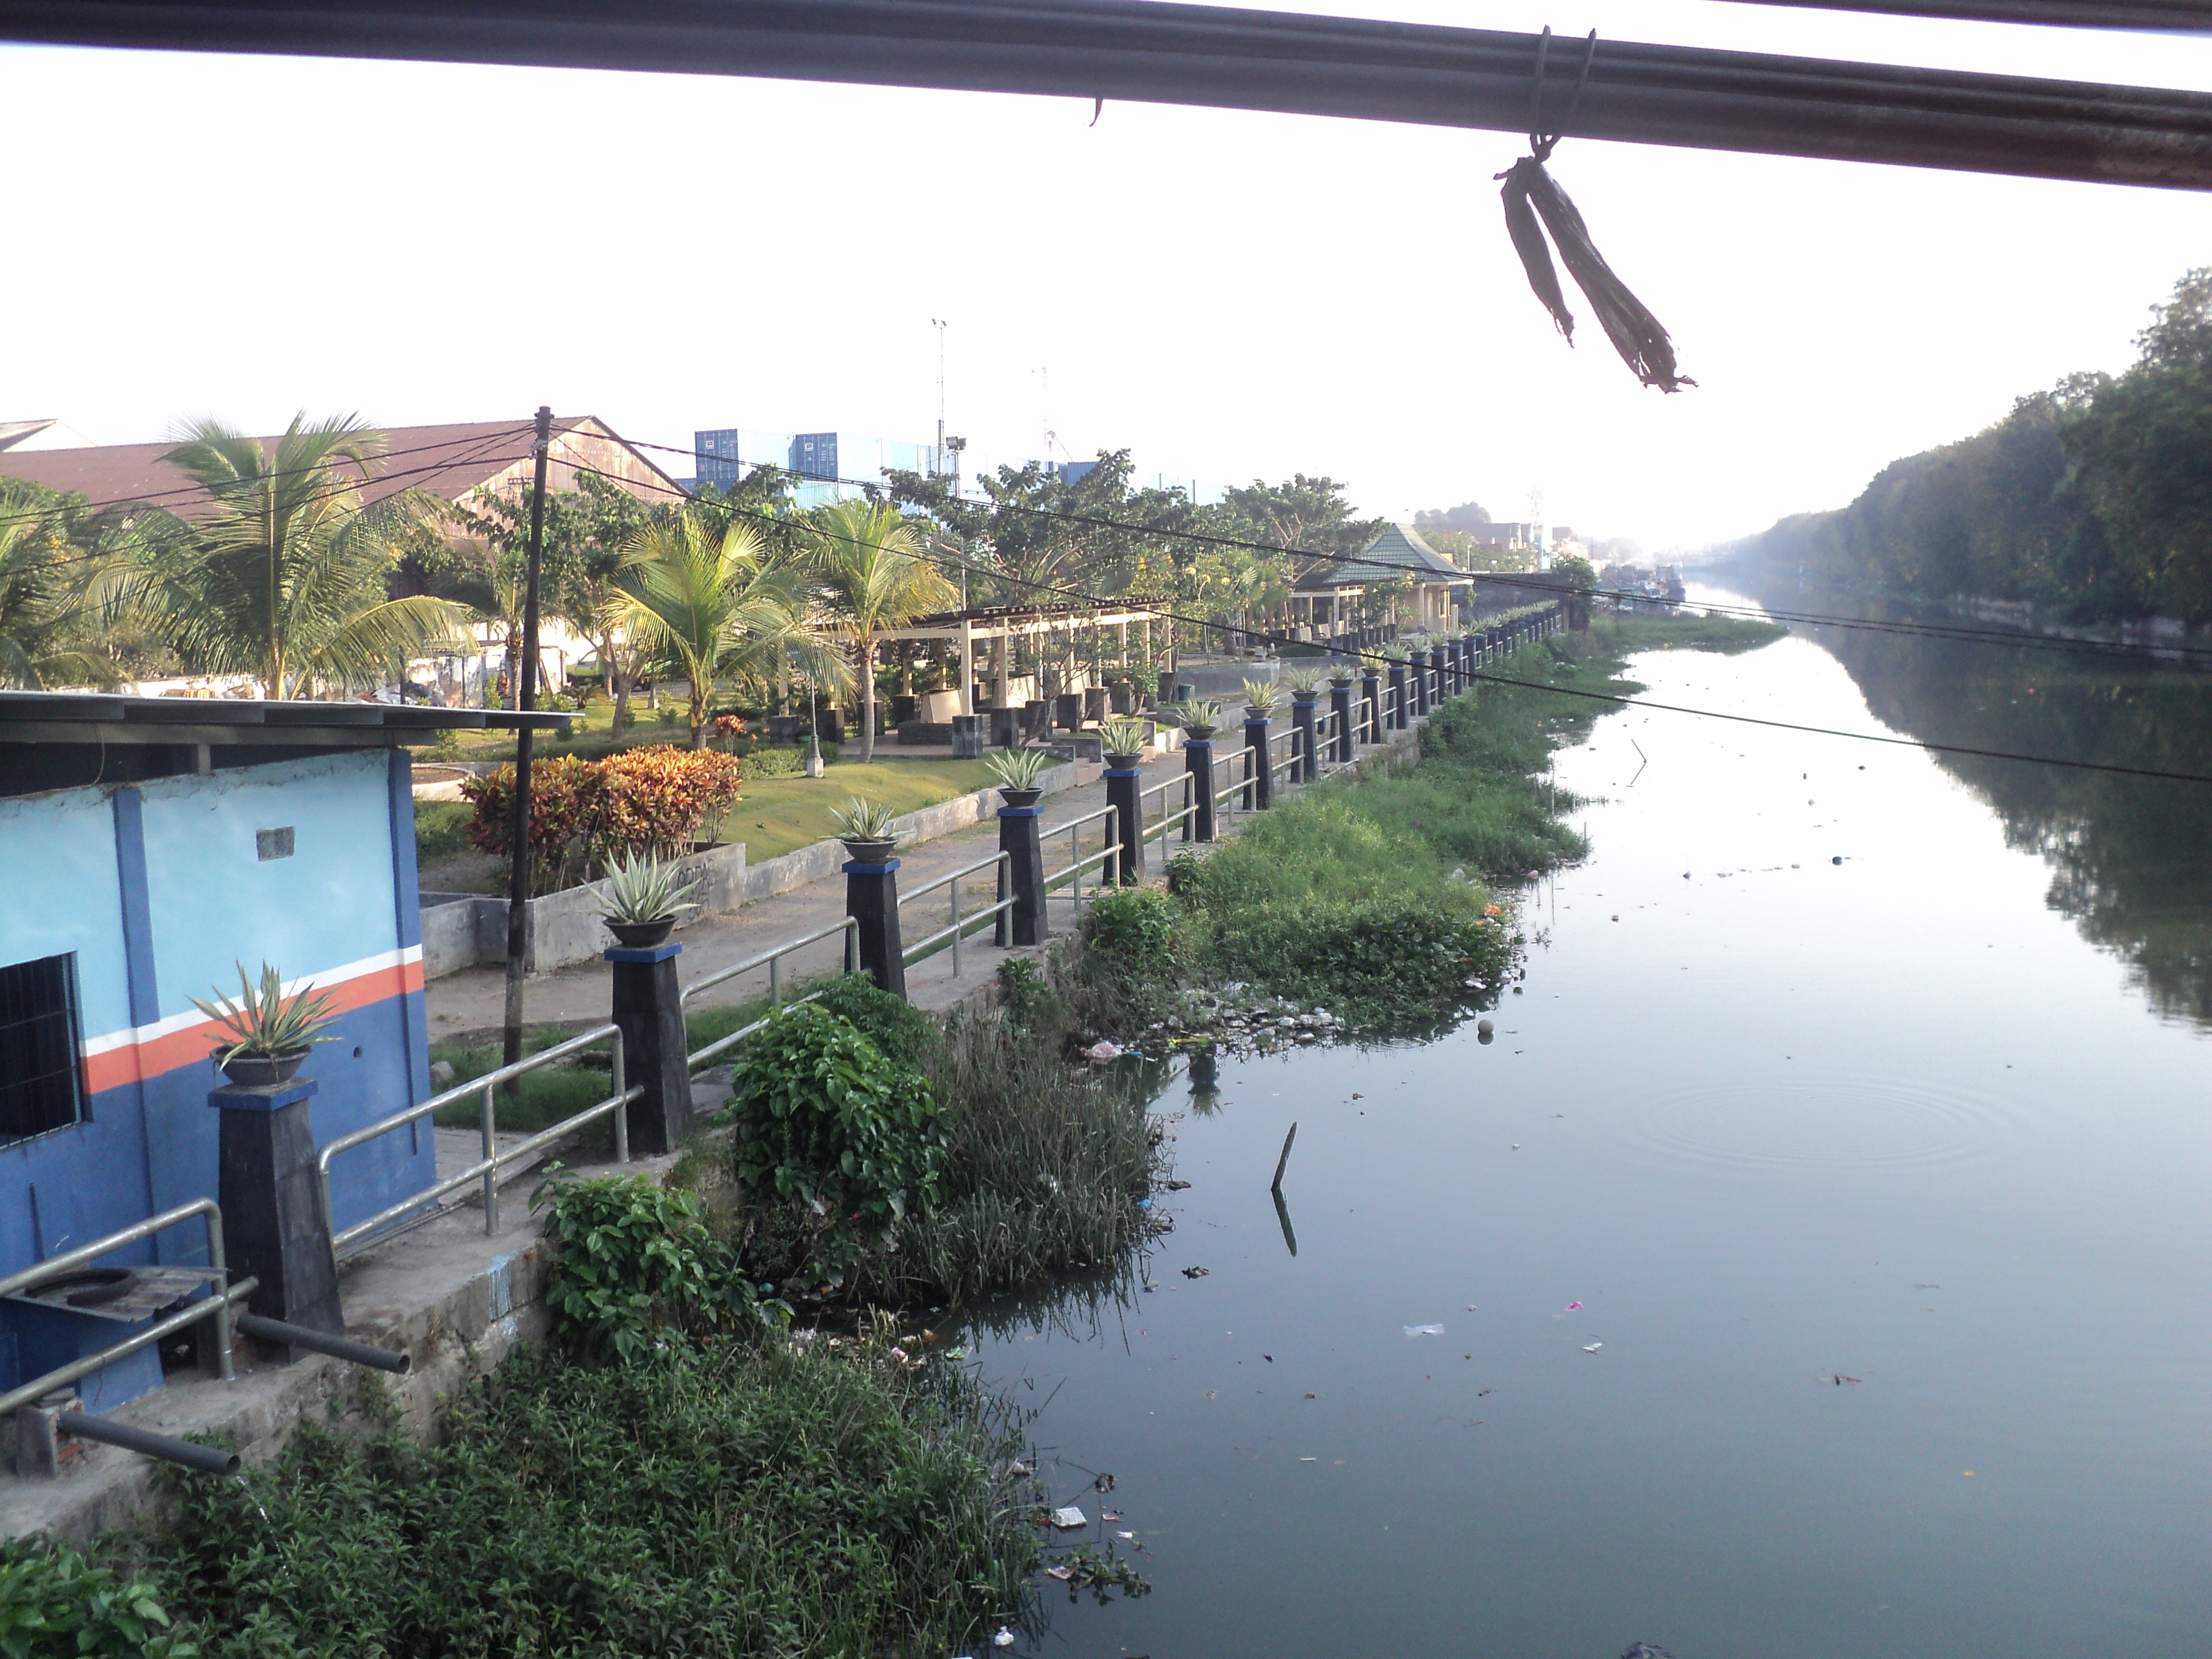 Taman Buah Buahan Pesona Kota Surabaya Petekan Undaan